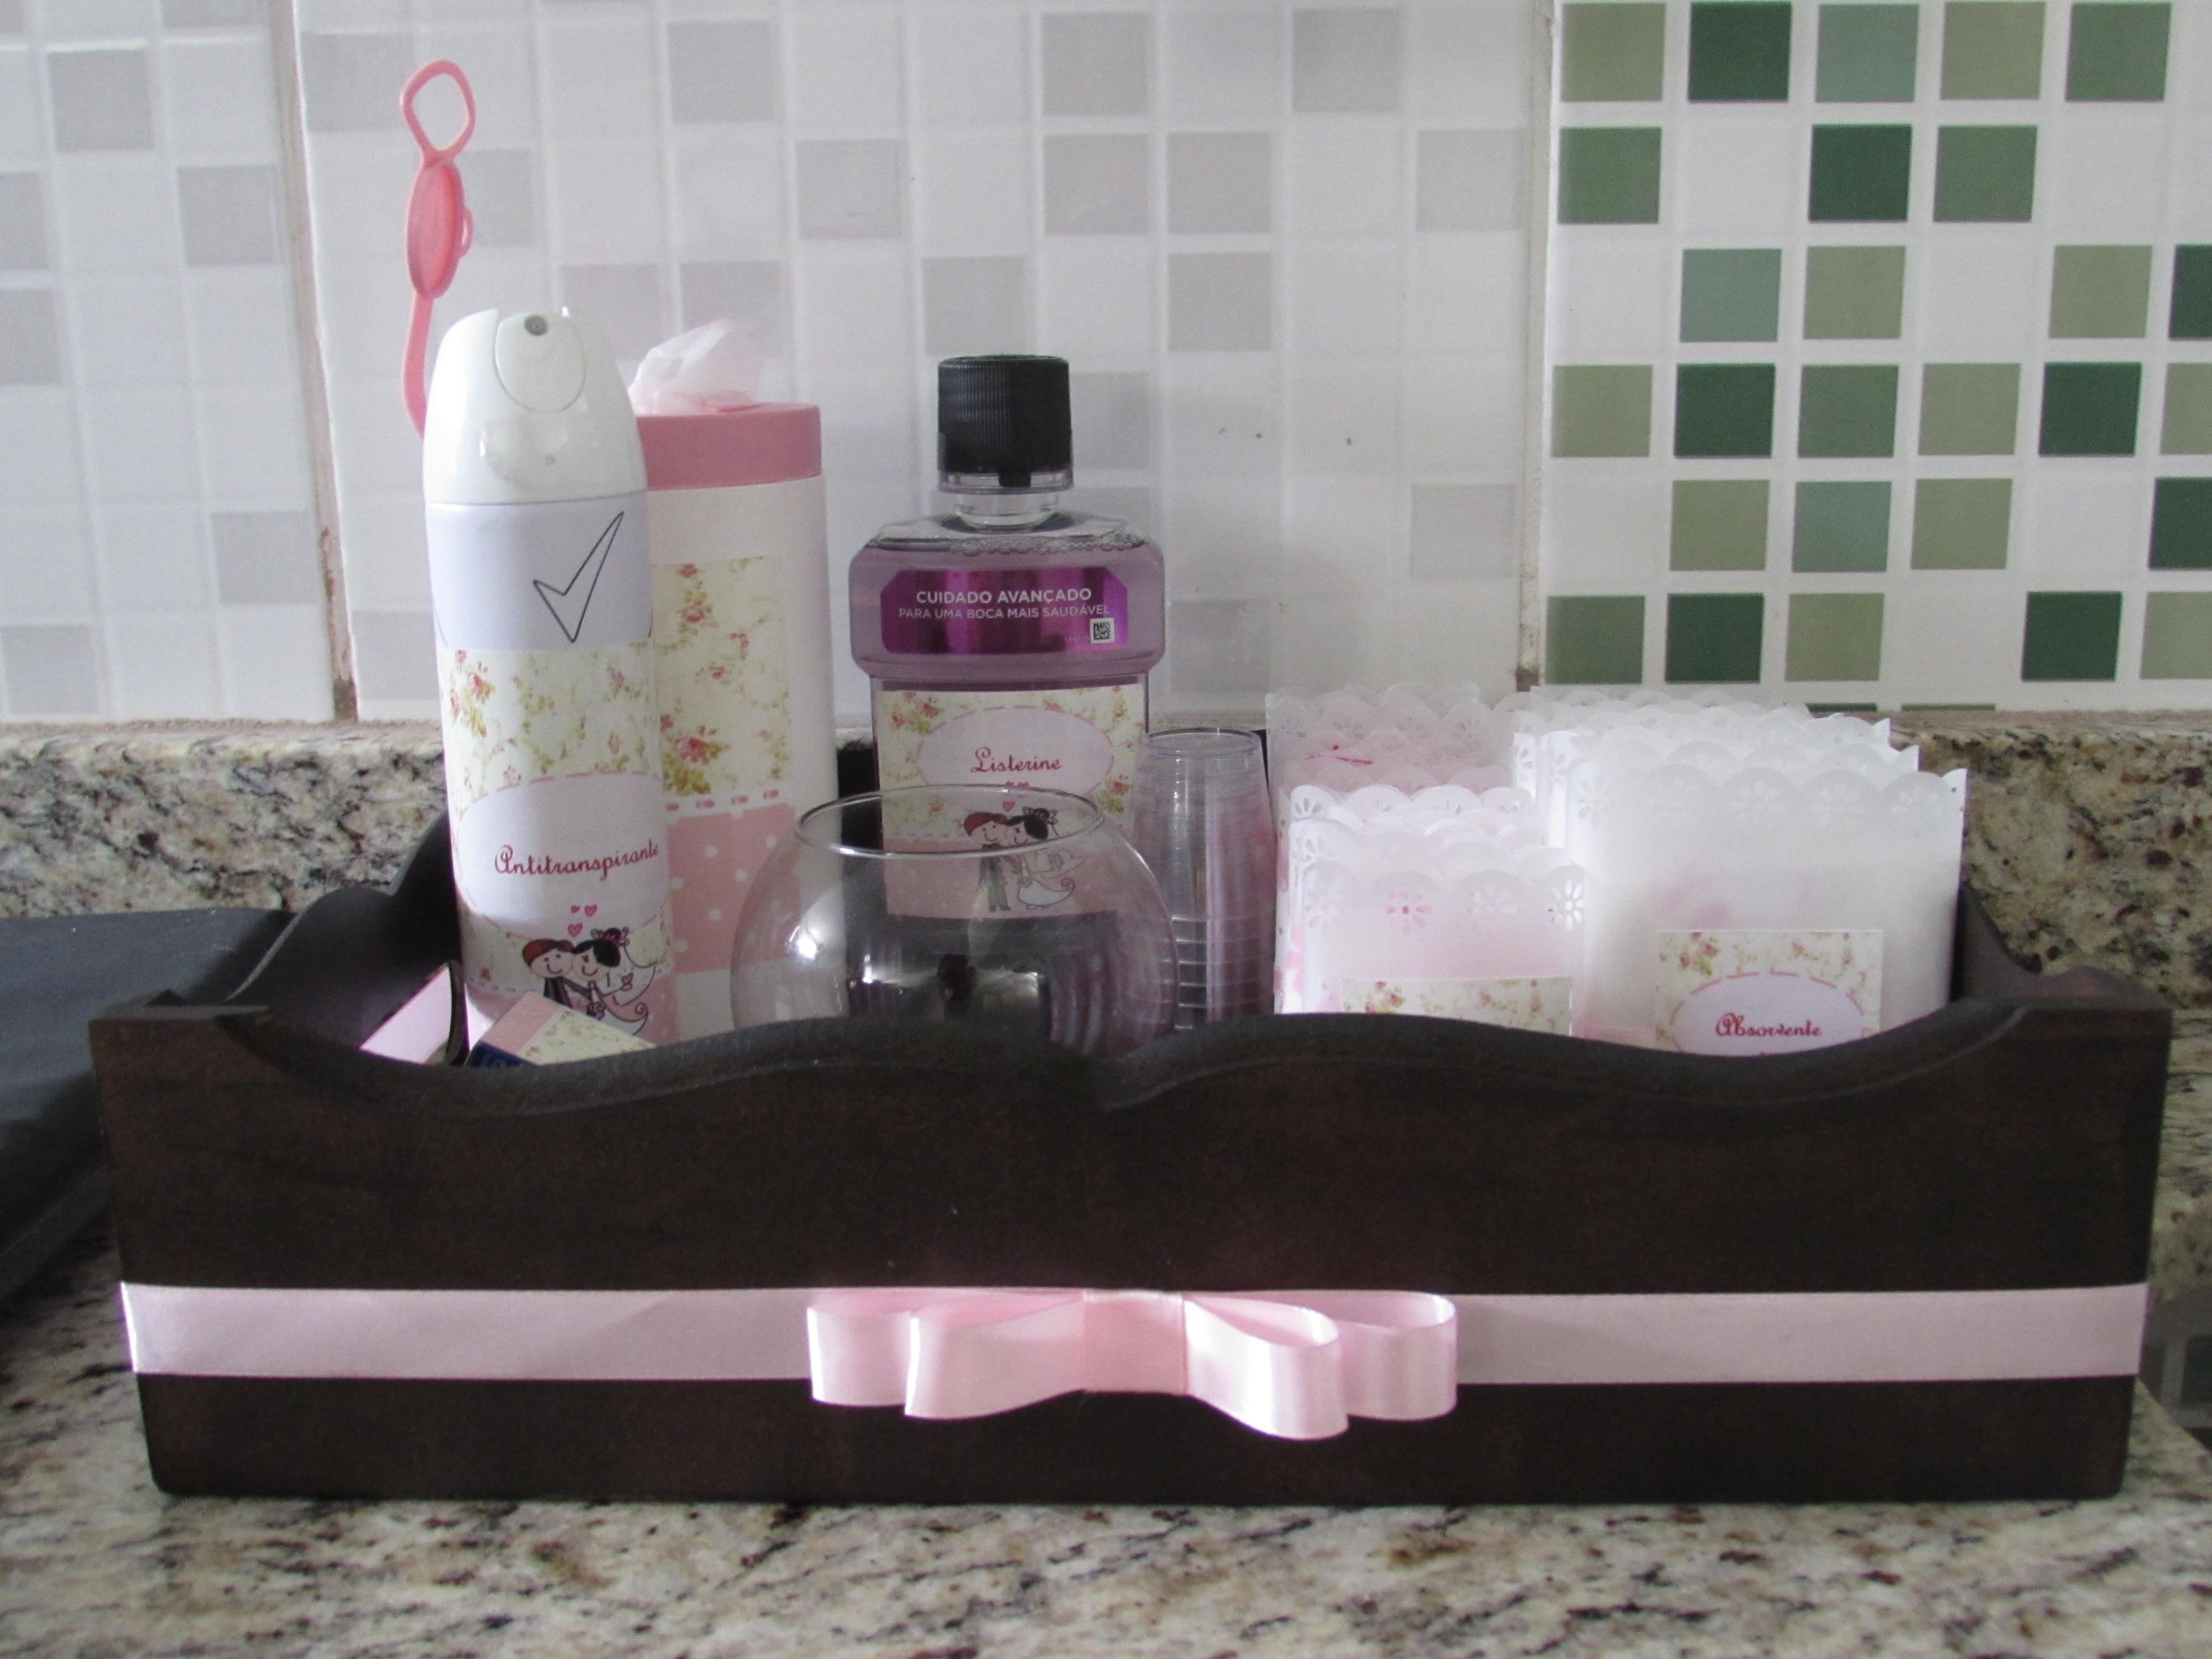 Kit toalete para banheiro feminino  amopontorusso  Elo7 # Kit Banheiro Feminino